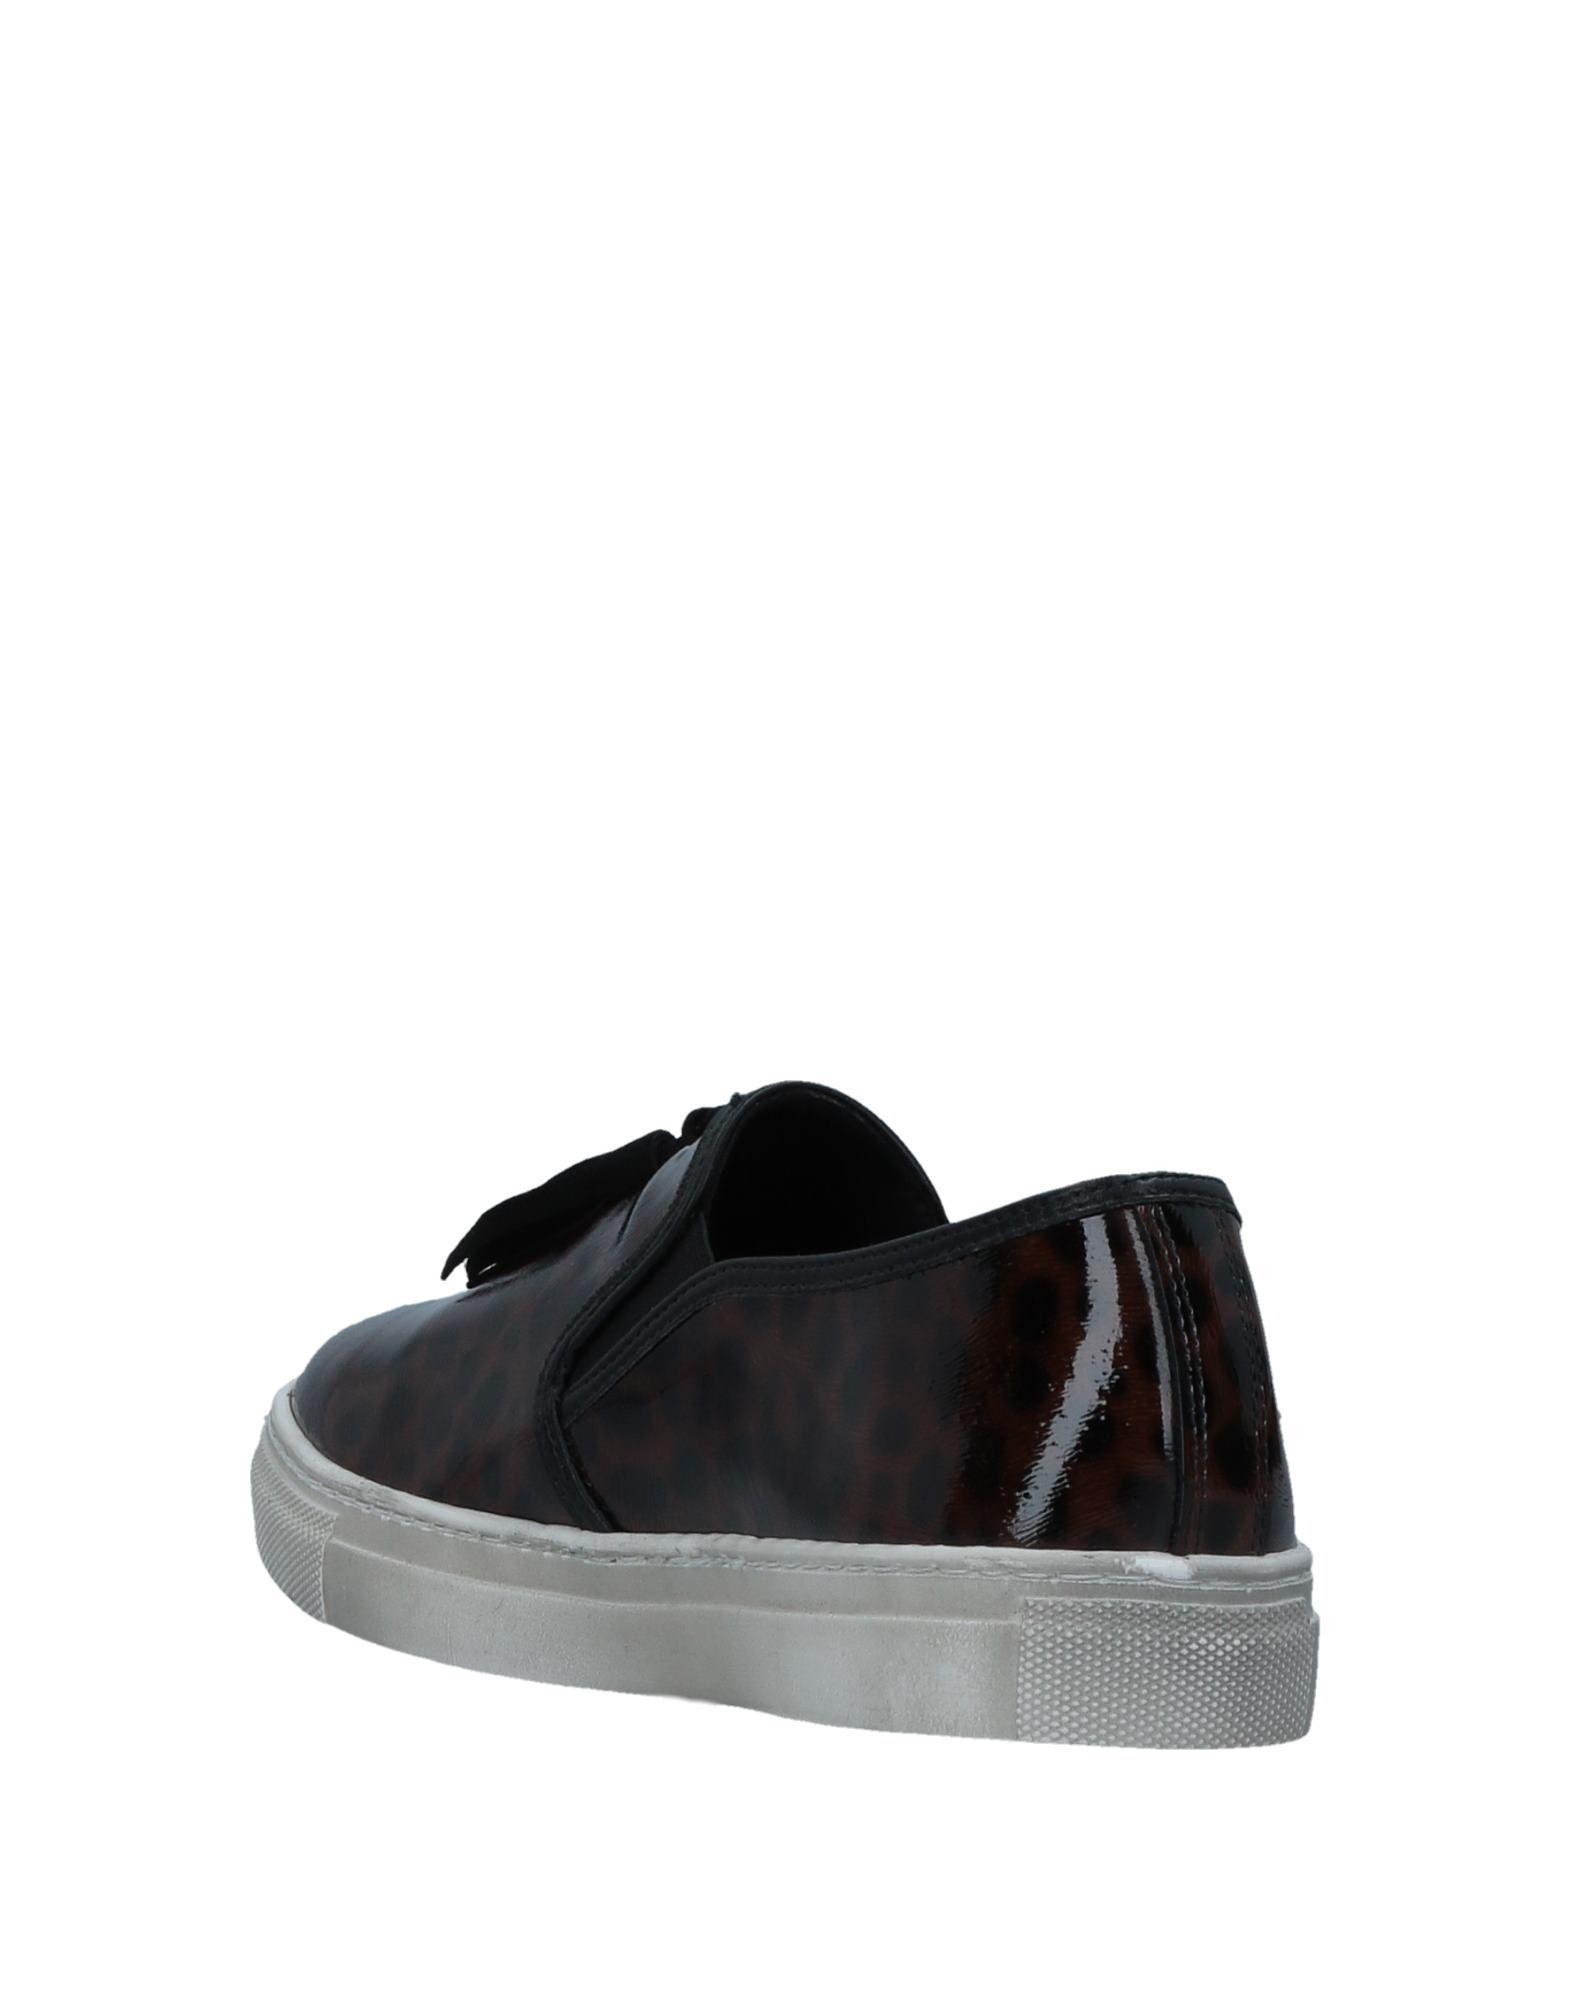 Clarys Sneakers Damen   Damen 11525470GK  c2e90a